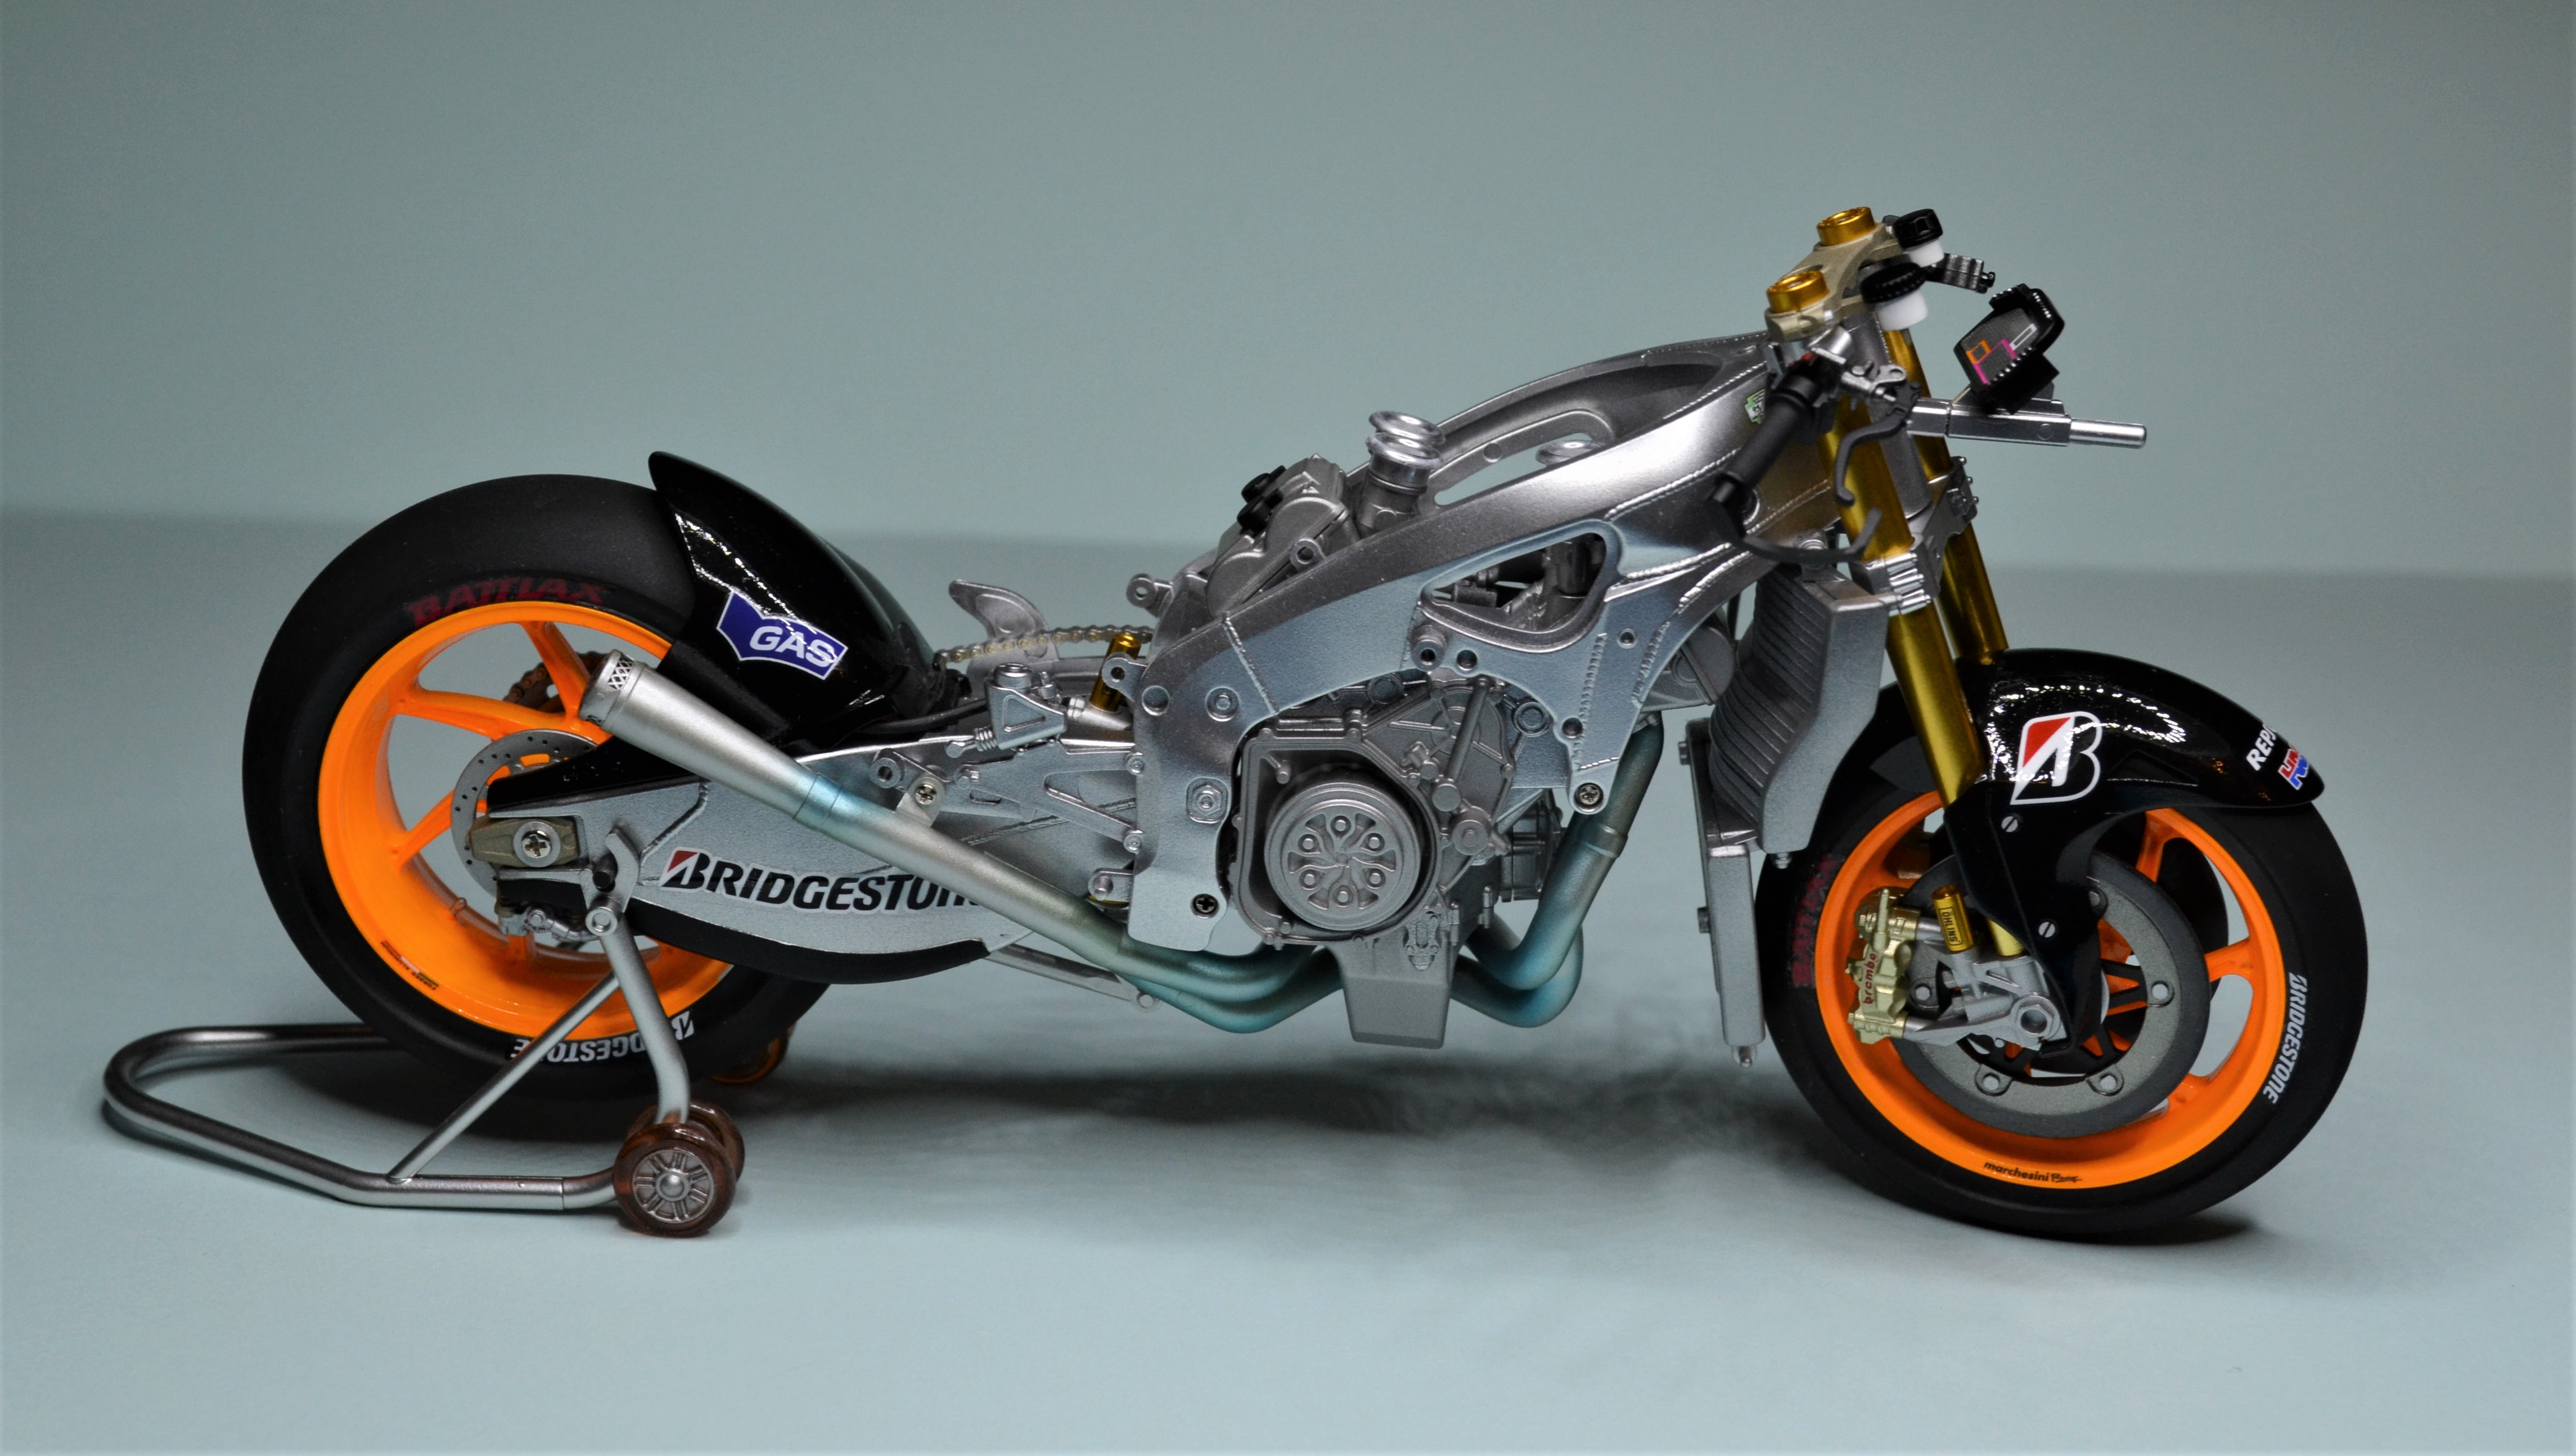 Honda Repsol Marc Marquez 1/12  - Page 2 170723090943402401